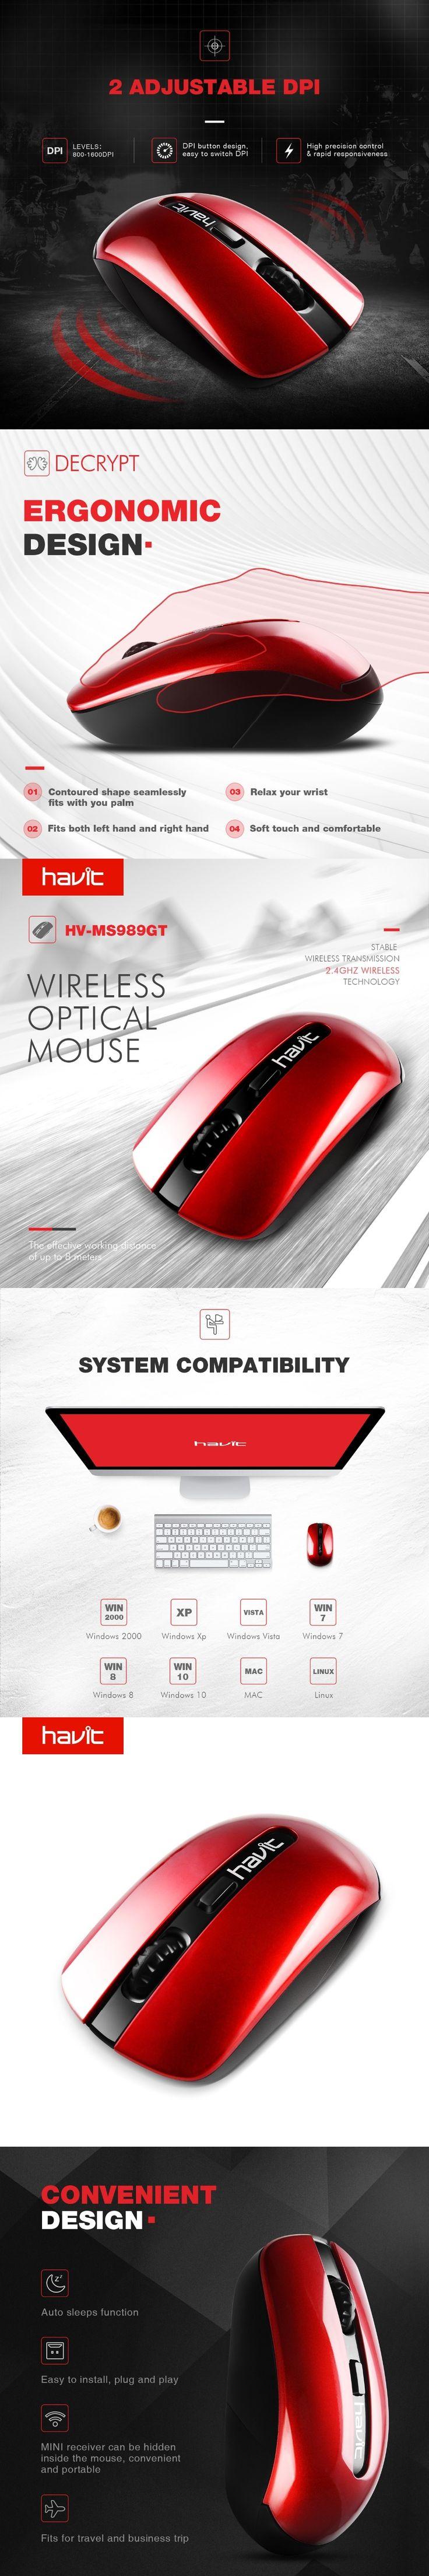 HAVIT  2.4G Wireless Gaming Mouse 800 1600DPI Relax Wrist Ergonomic Design Optical Mouse For PC Laptop Desktop HV-MS989GT